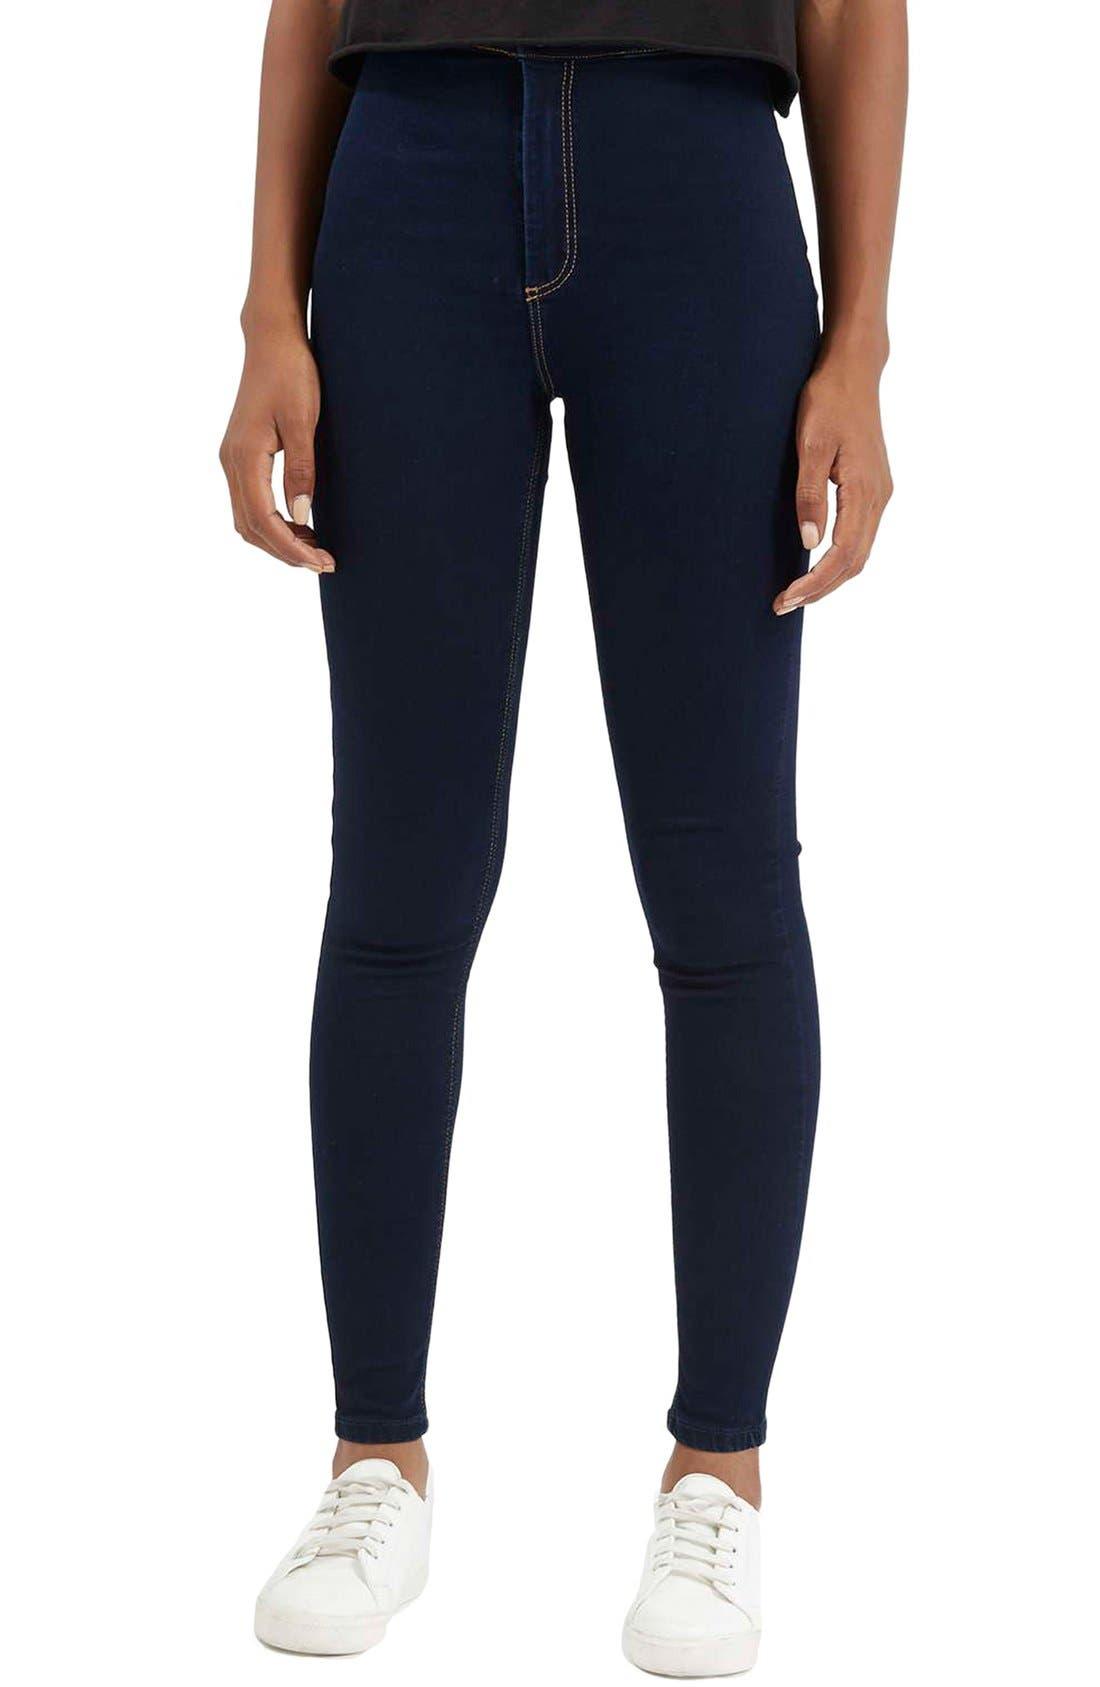 Alternate Image 1 Selected - Topshop Moto 'Joni' Super Skinny Jeans  (Regular & Short)